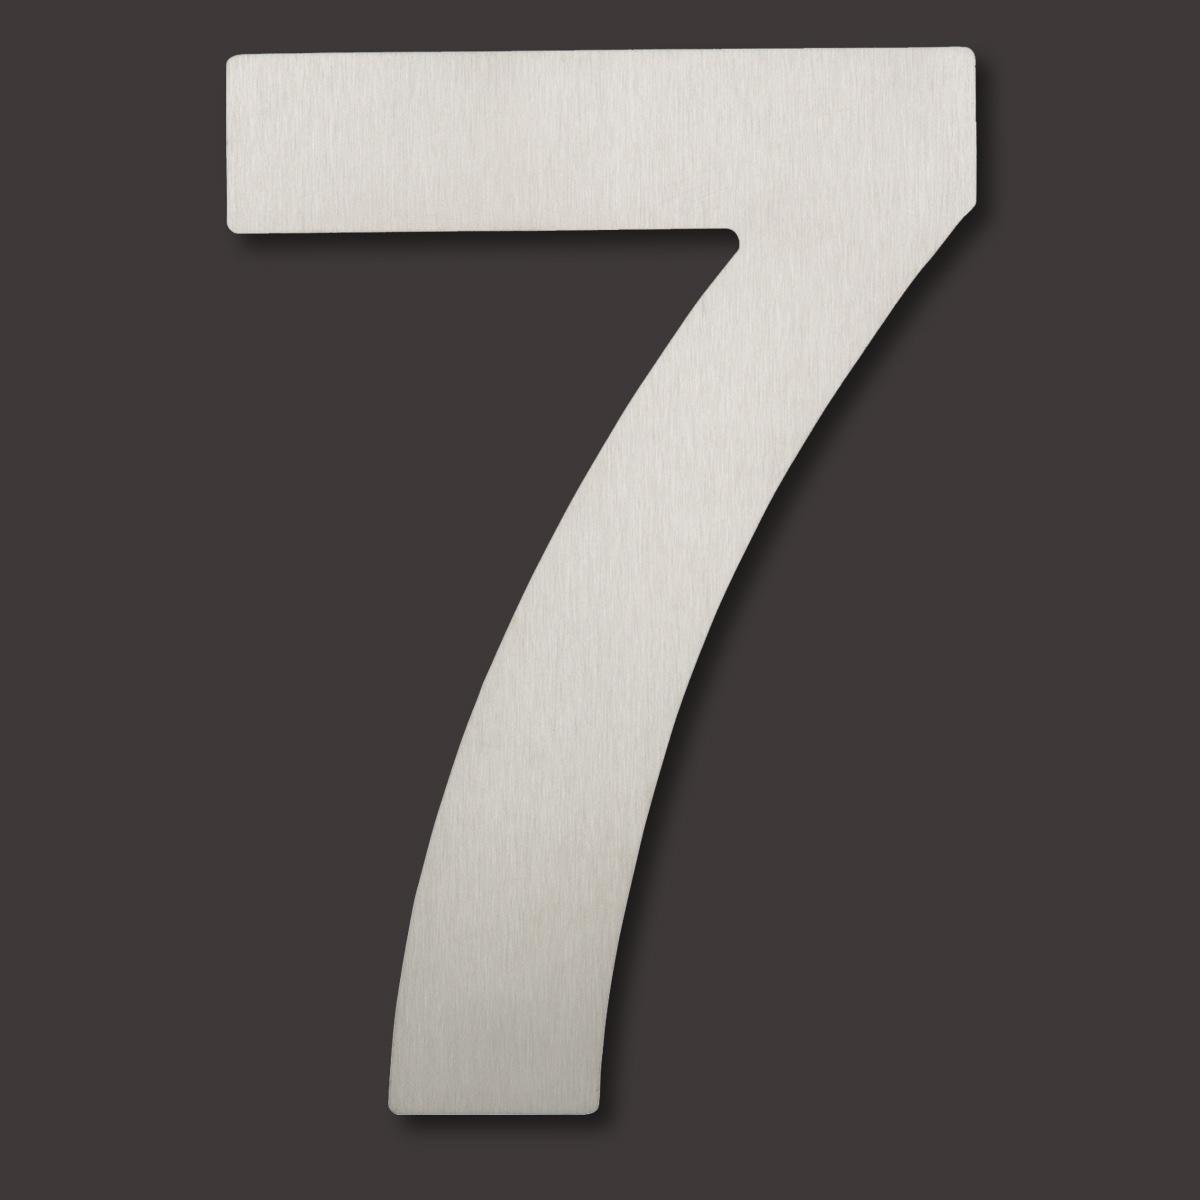 edelstahl hausnummer 7 fein geb rstet h he 20 cm hausnummer 7 malux shop. Black Bedroom Furniture Sets. Home Design Ideas